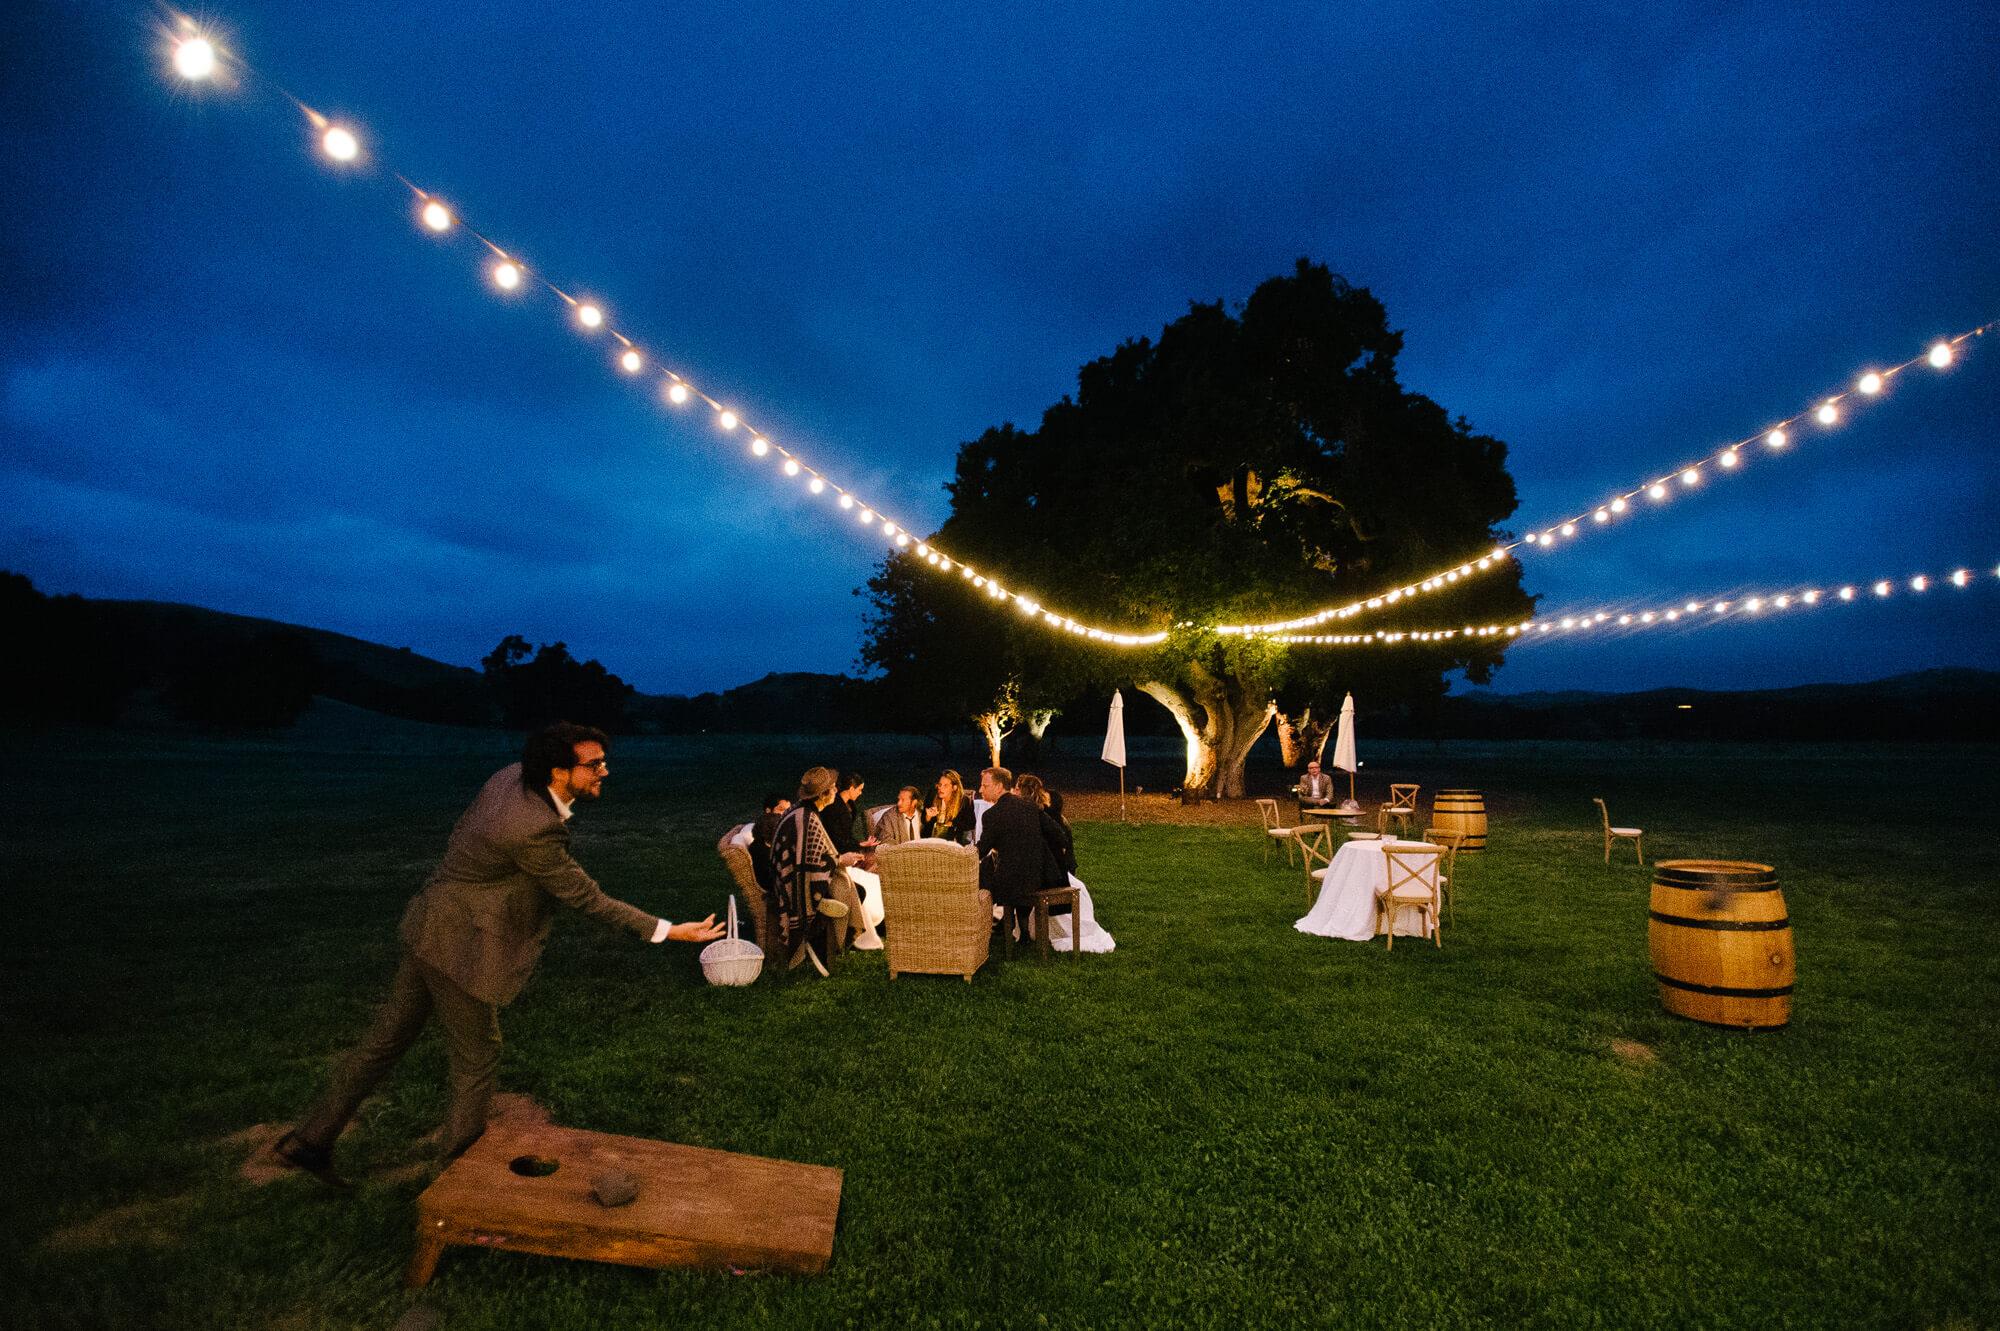 los-olivos-firestone-winery-destination-wedding-central-coast-wedding-photographer-27.jpg